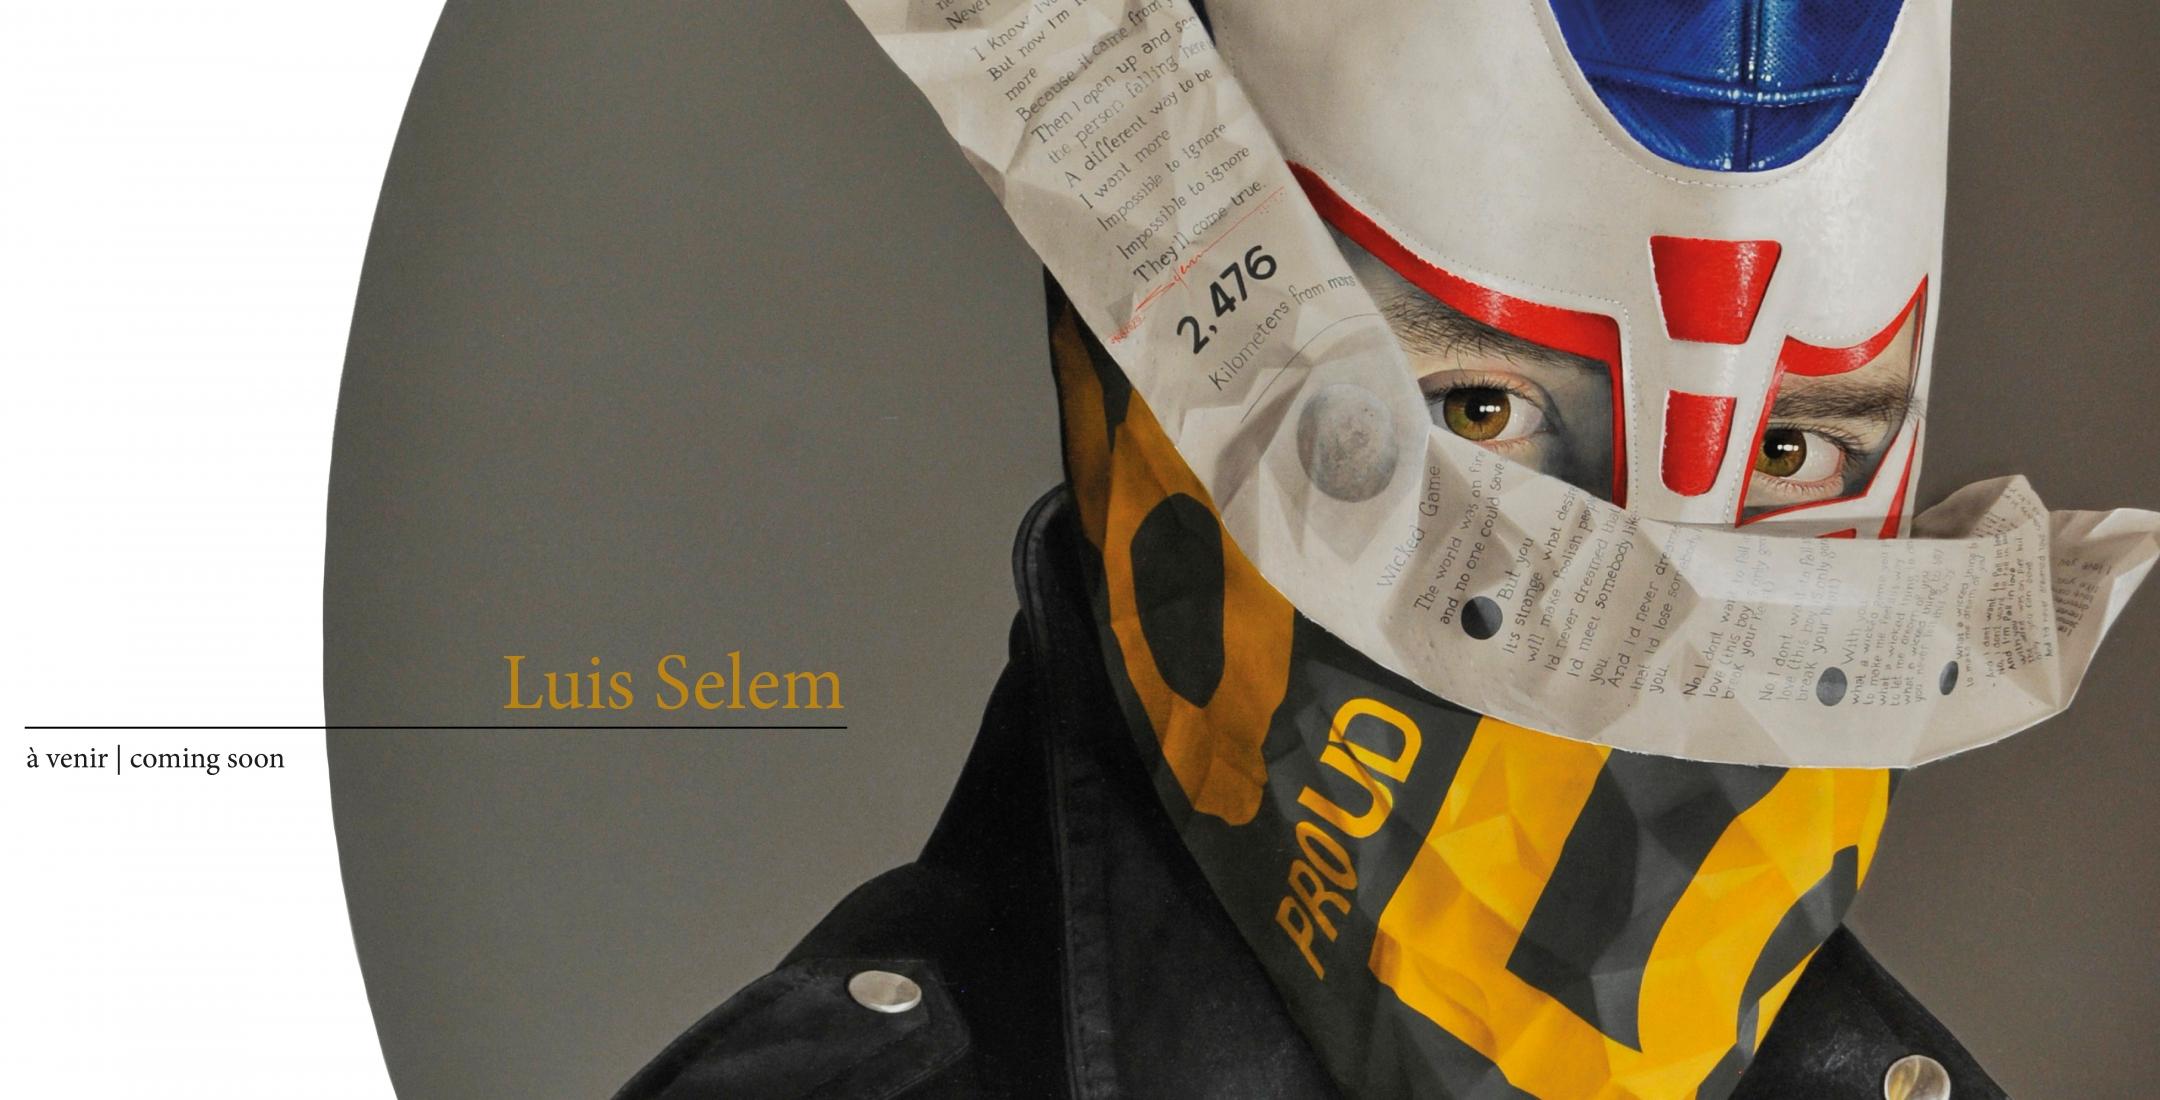 Luis Selem